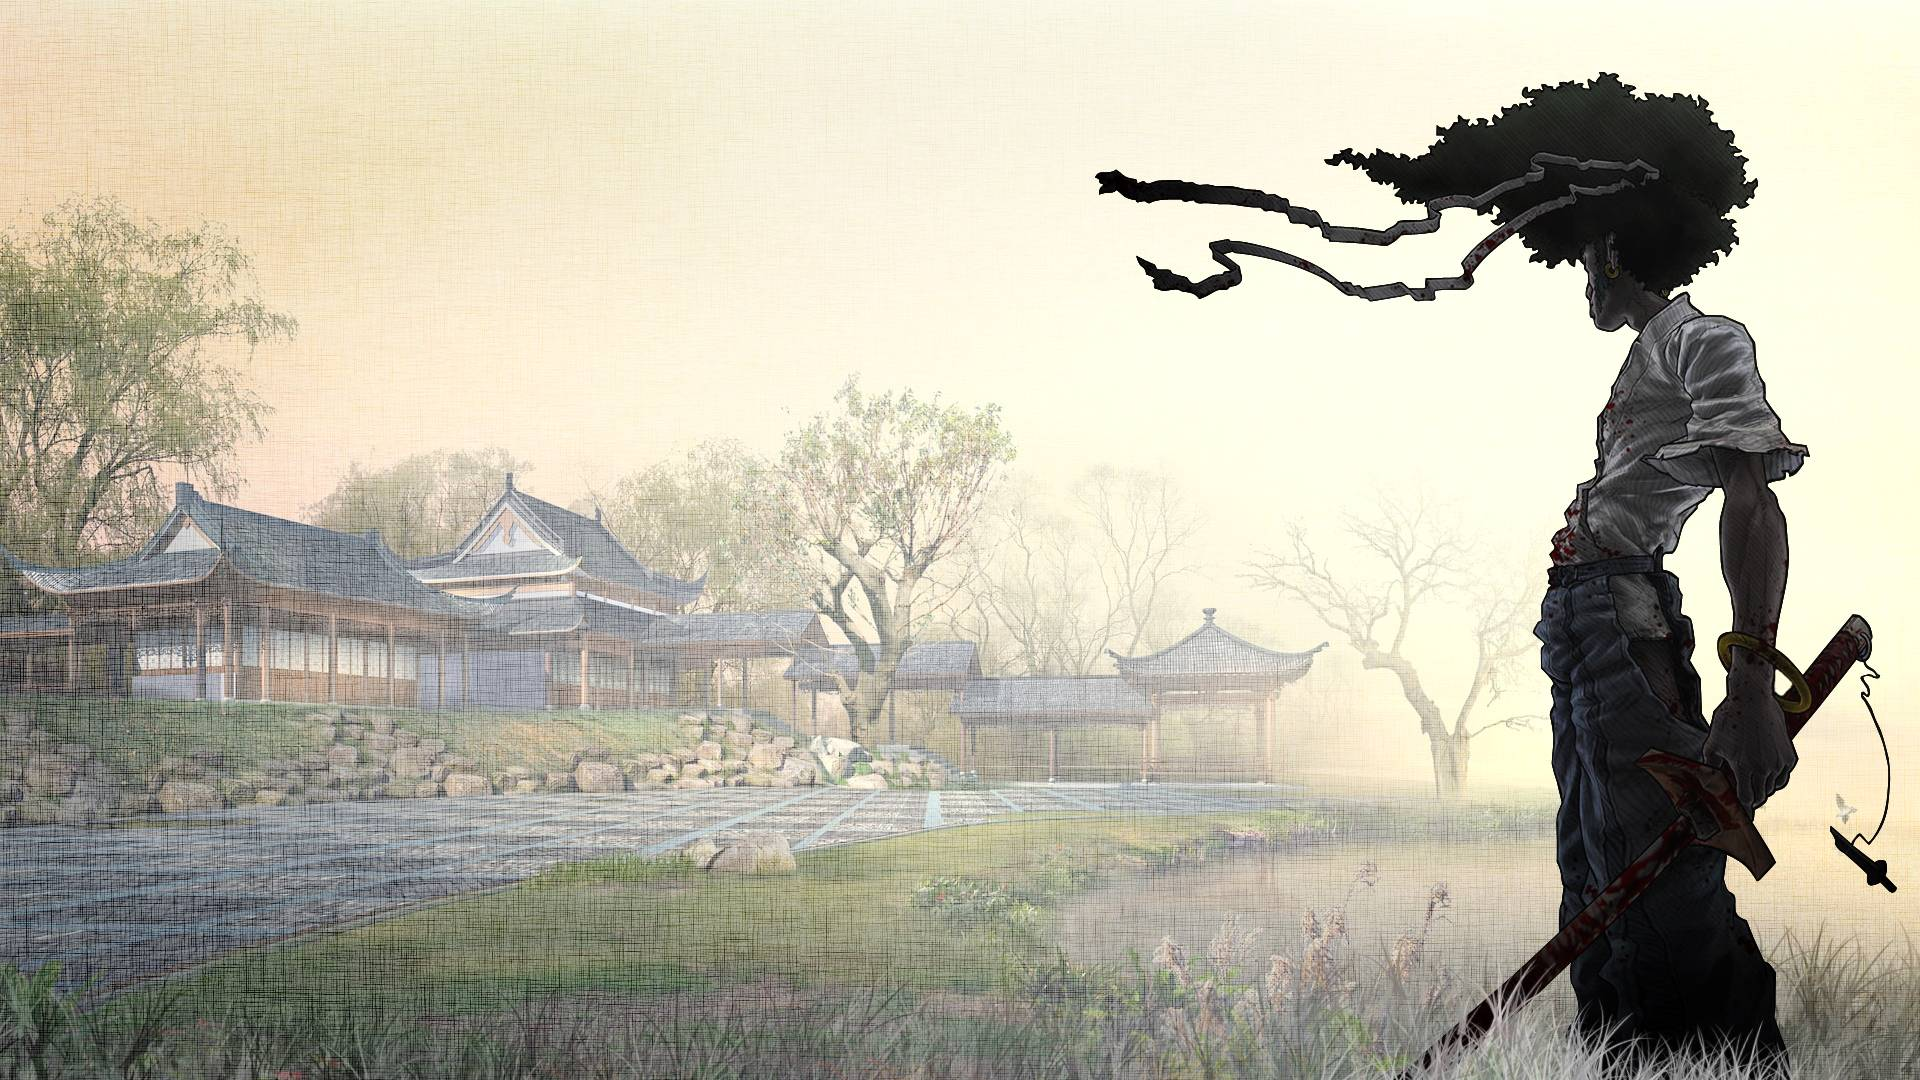 japanese katana wallpaper hd - photo #44